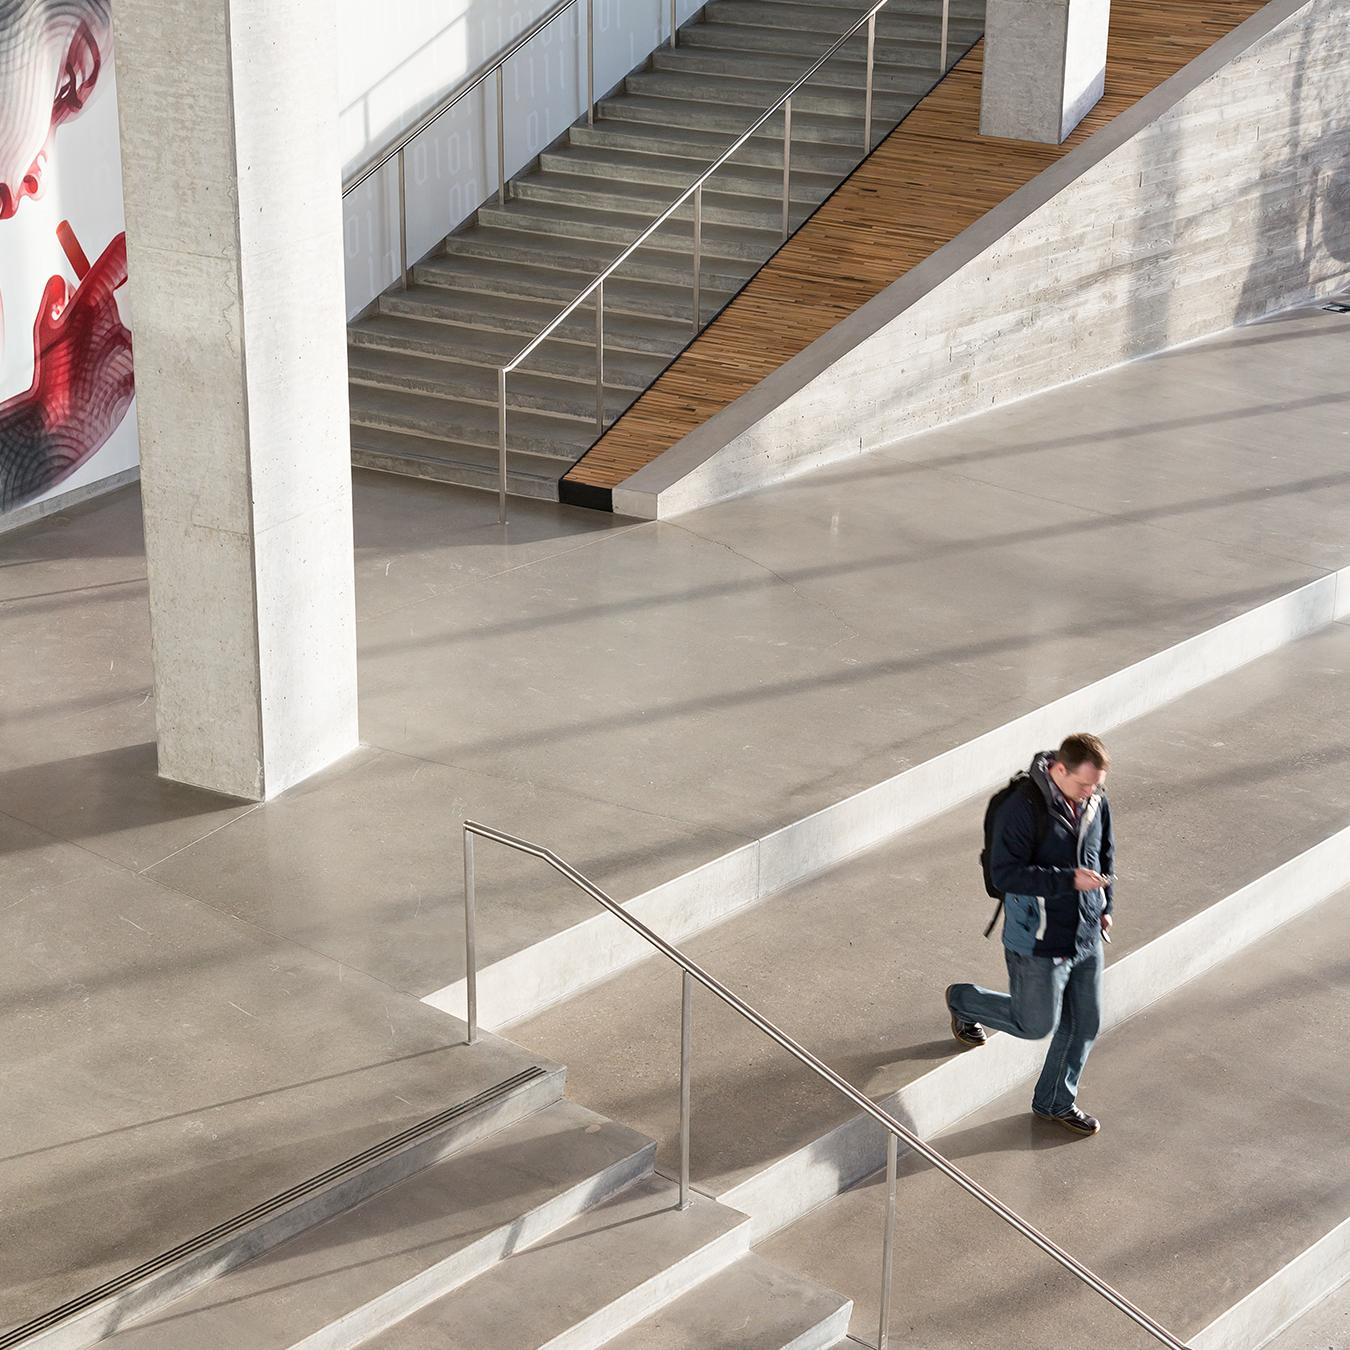 Adobe stair detail